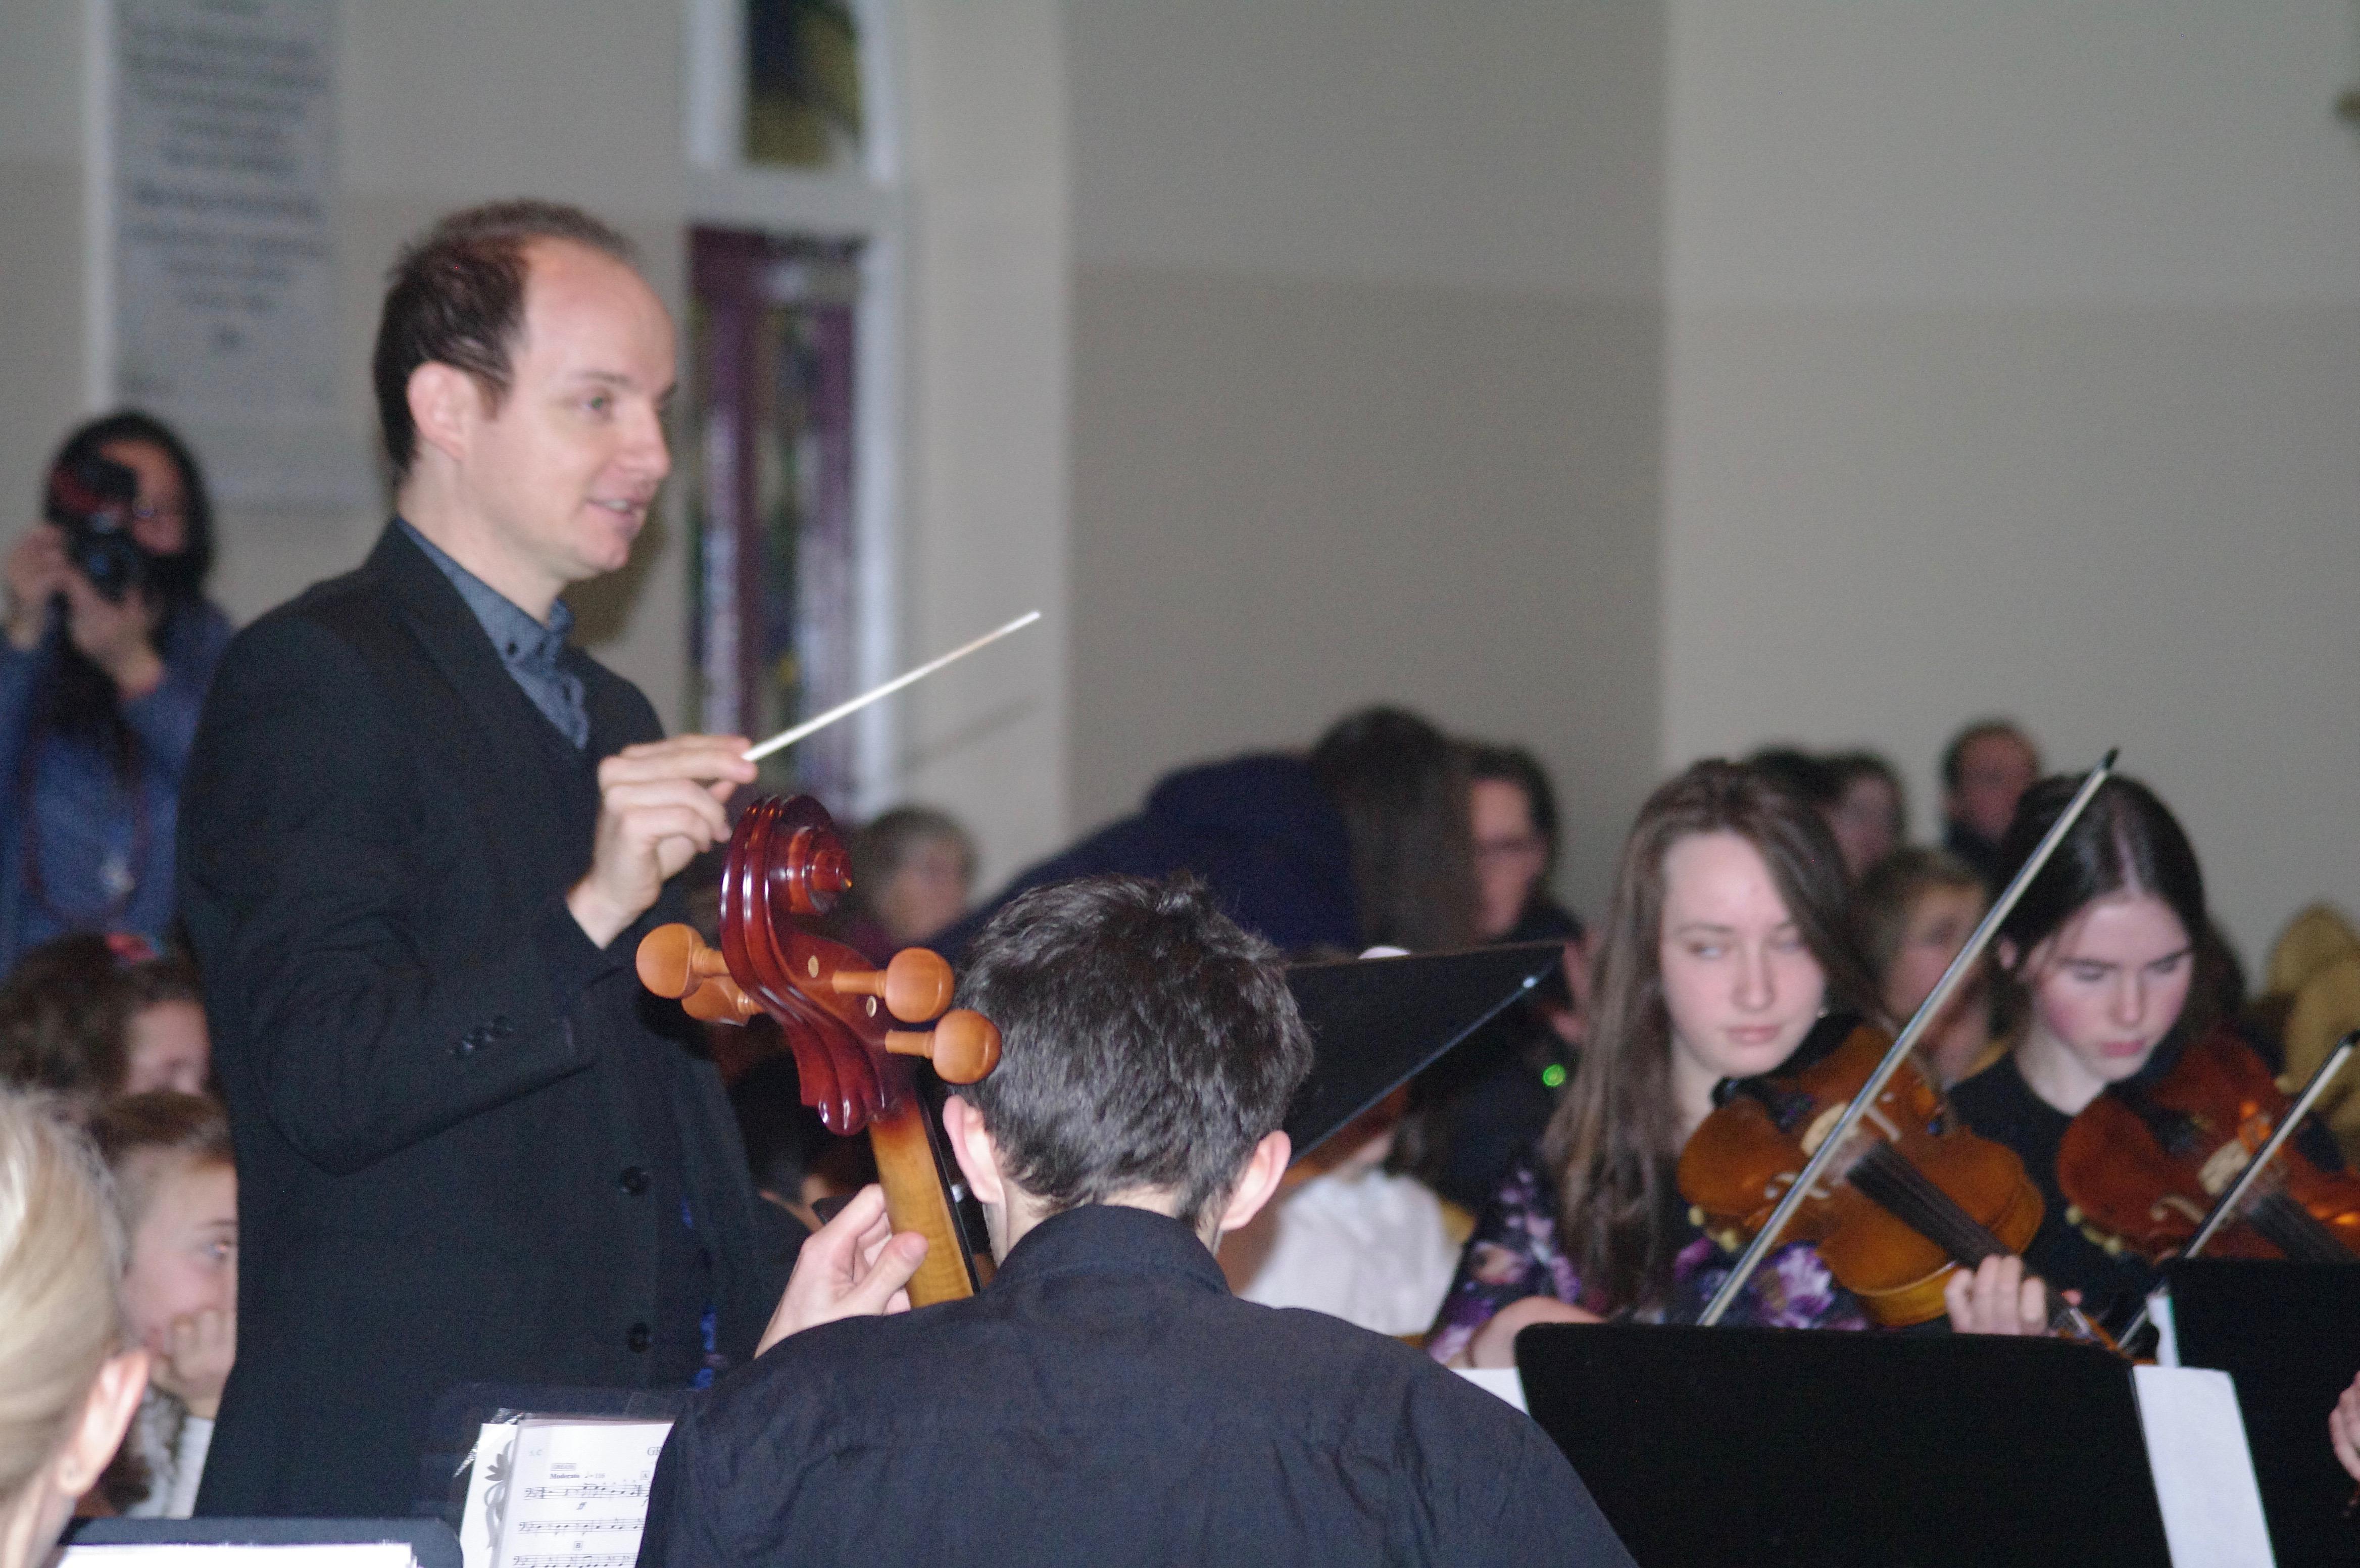 Peter Sebeysten